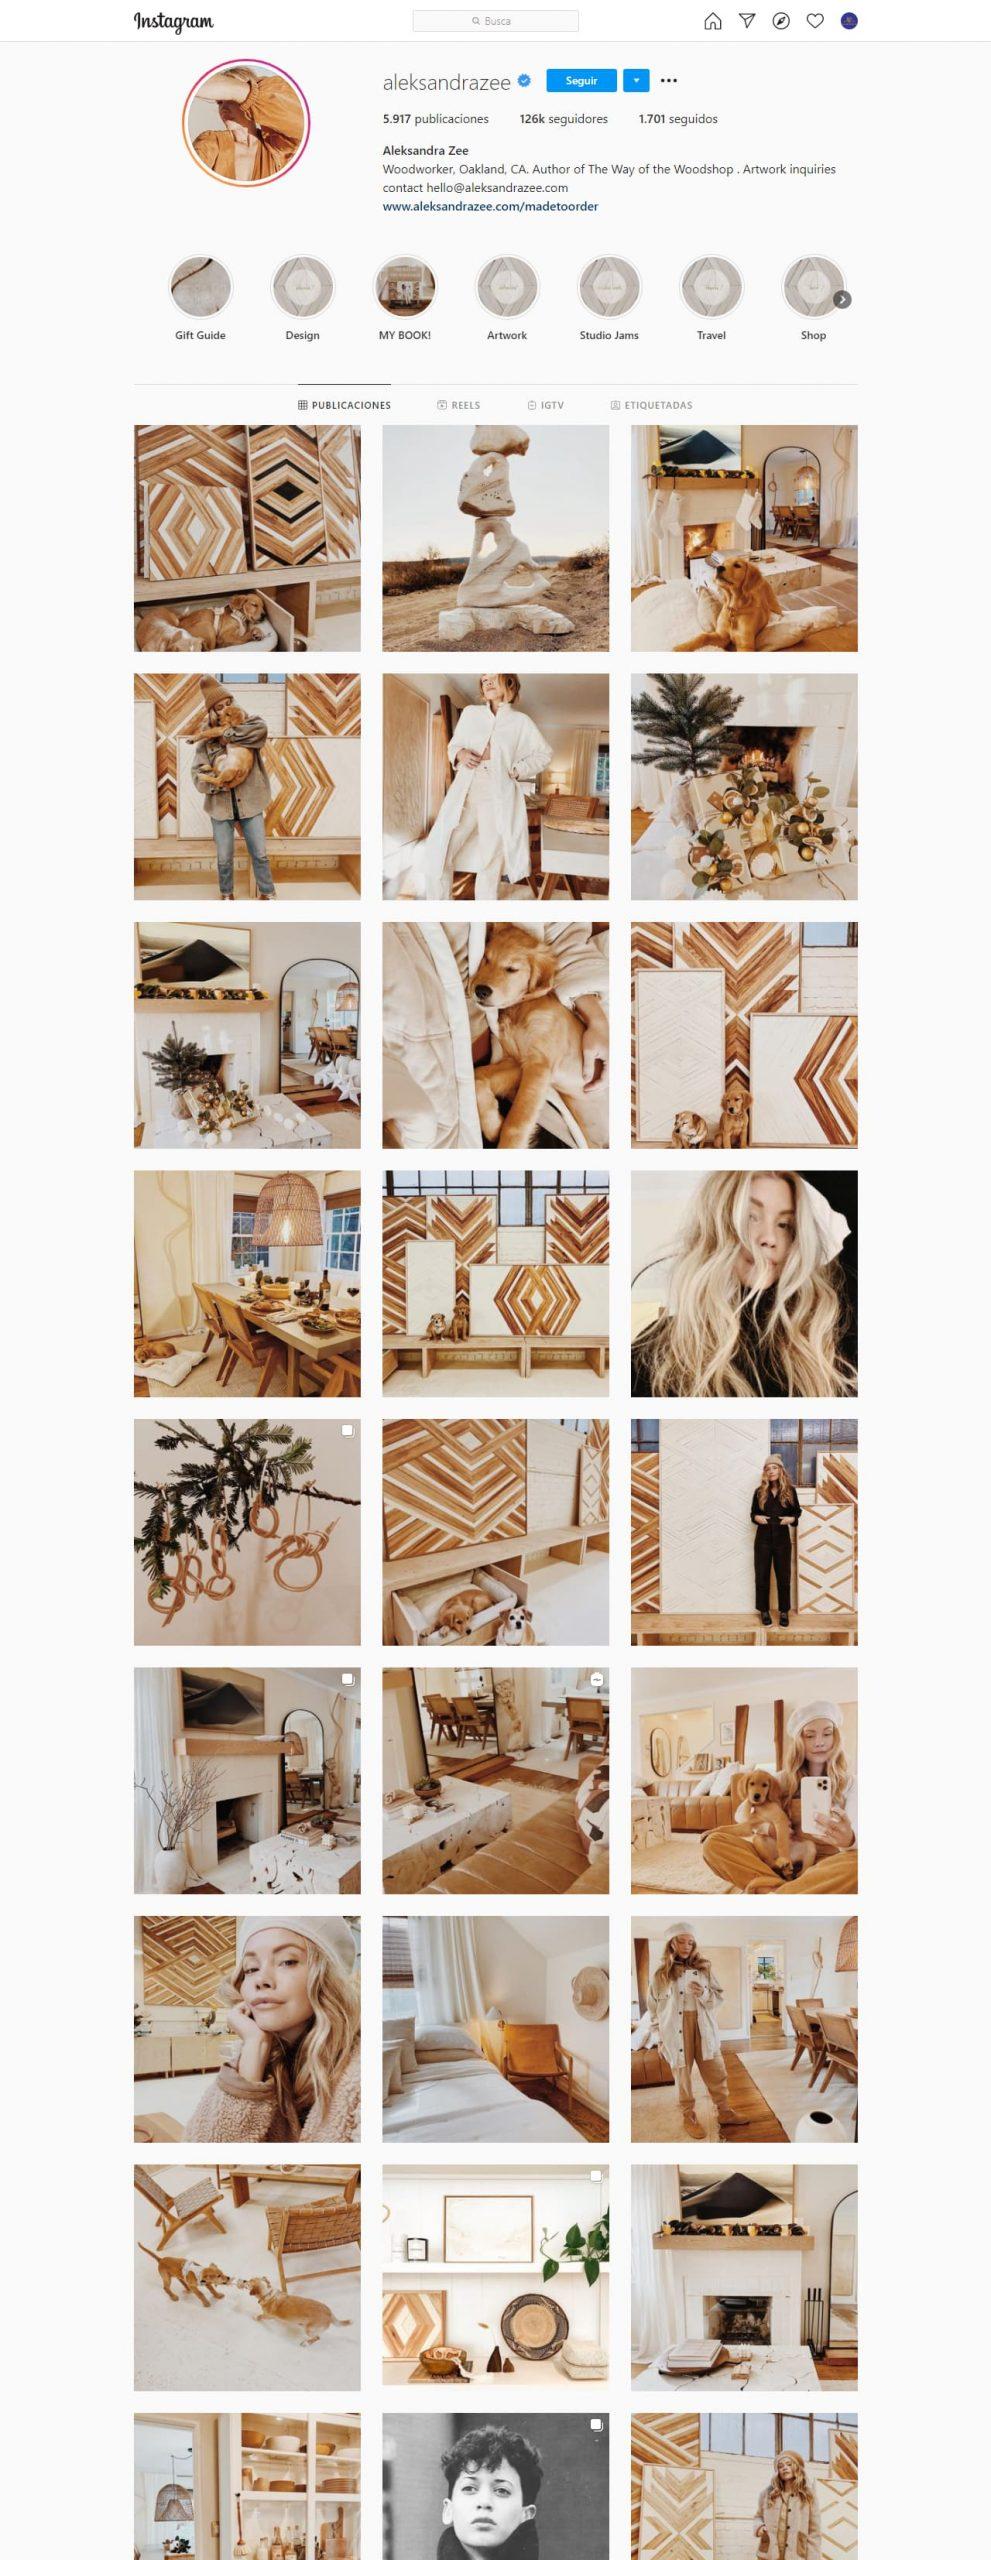 Aleksandrazee Feed Instagram